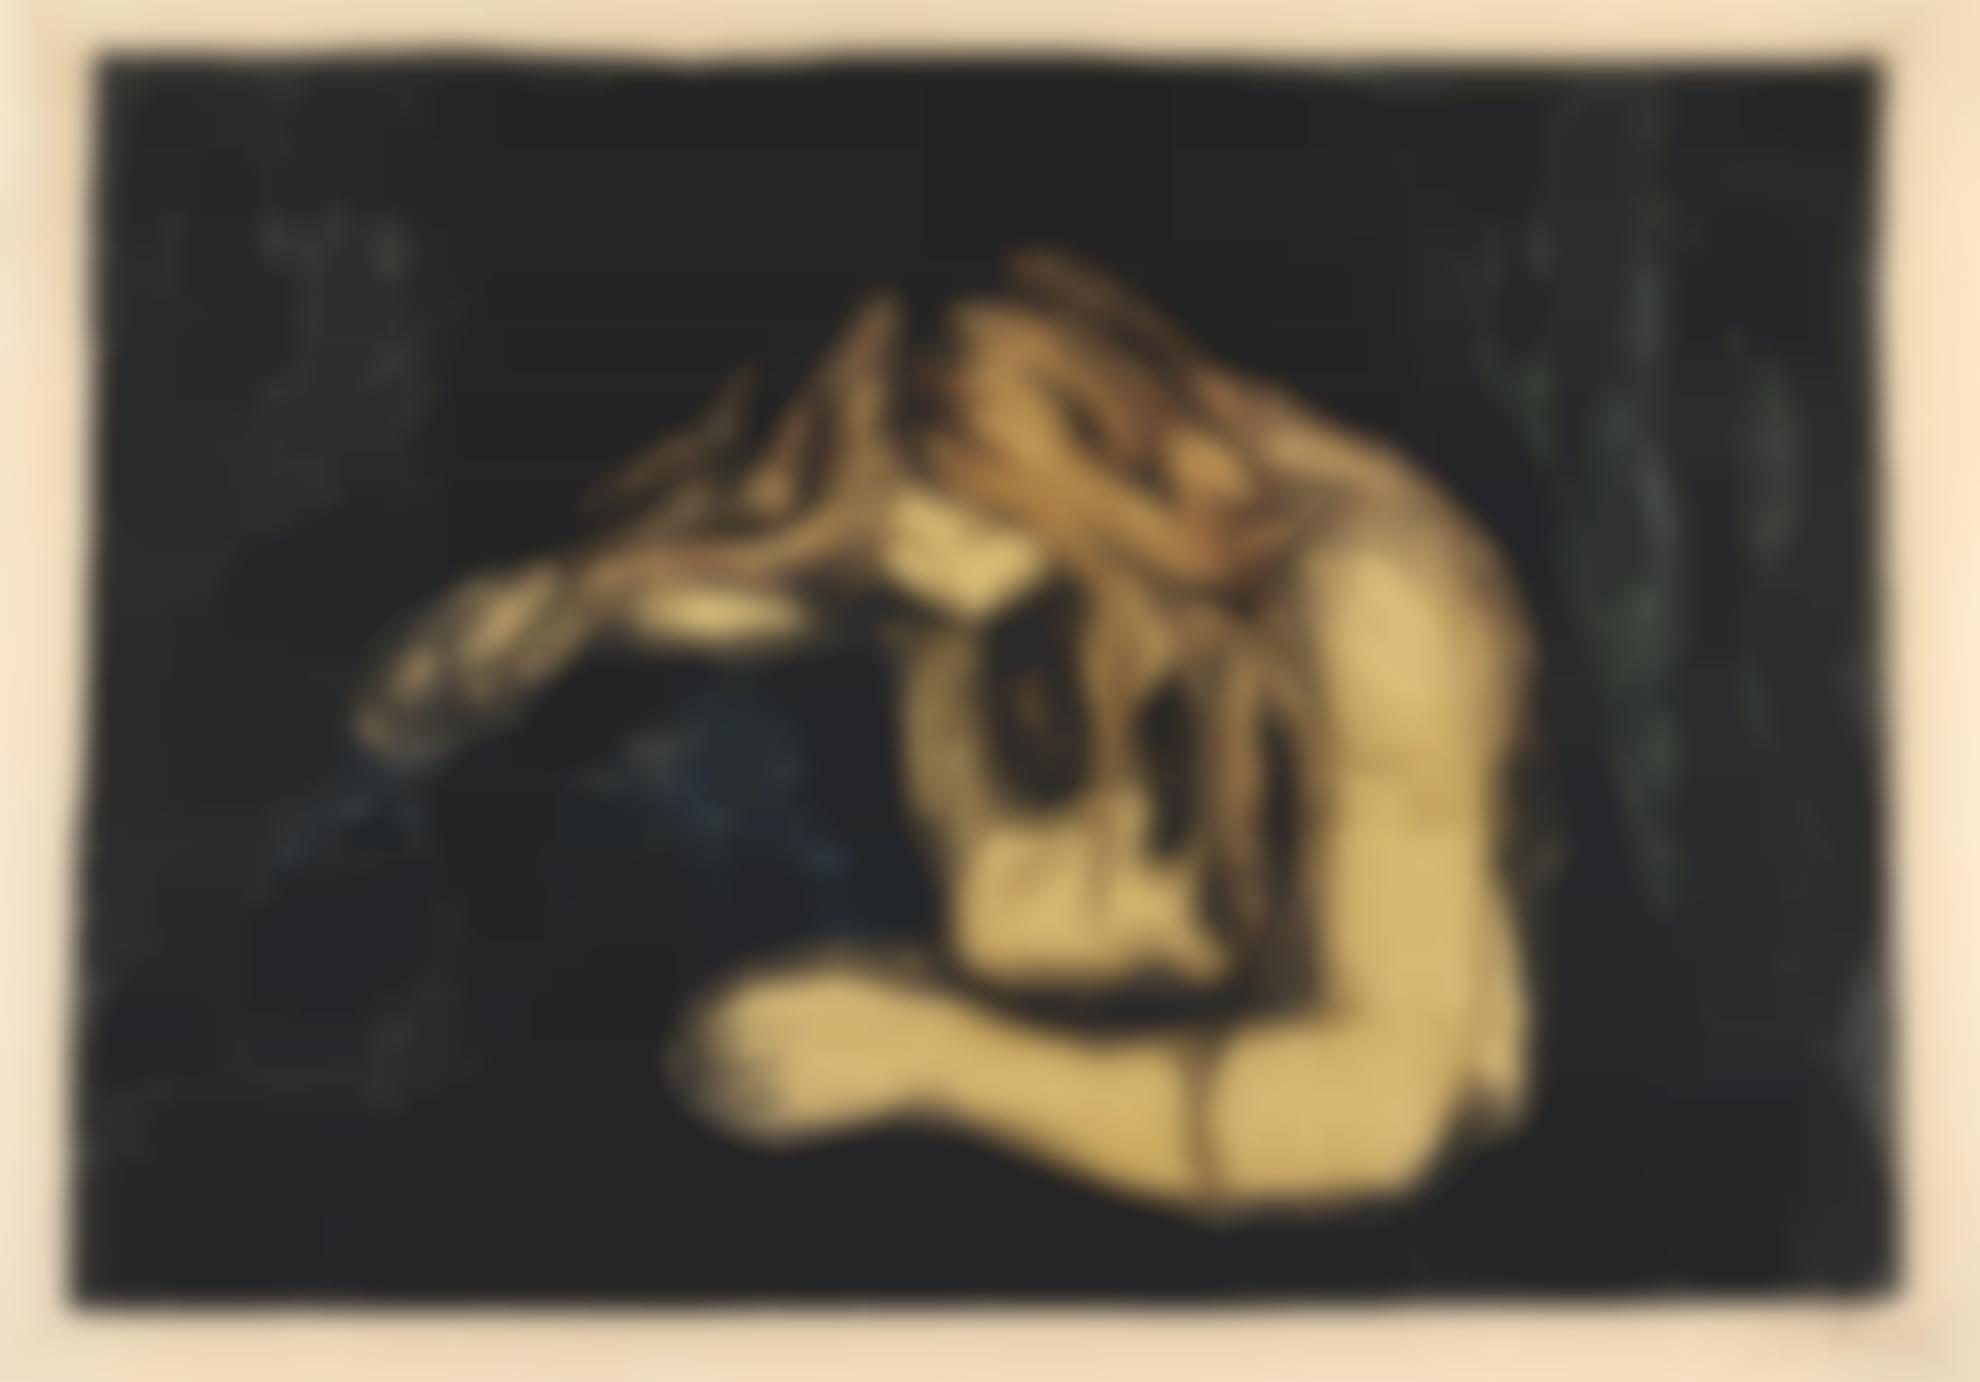 Edvard Munch-Vampire Ii (Woll 41; Schiefler 34)-1902